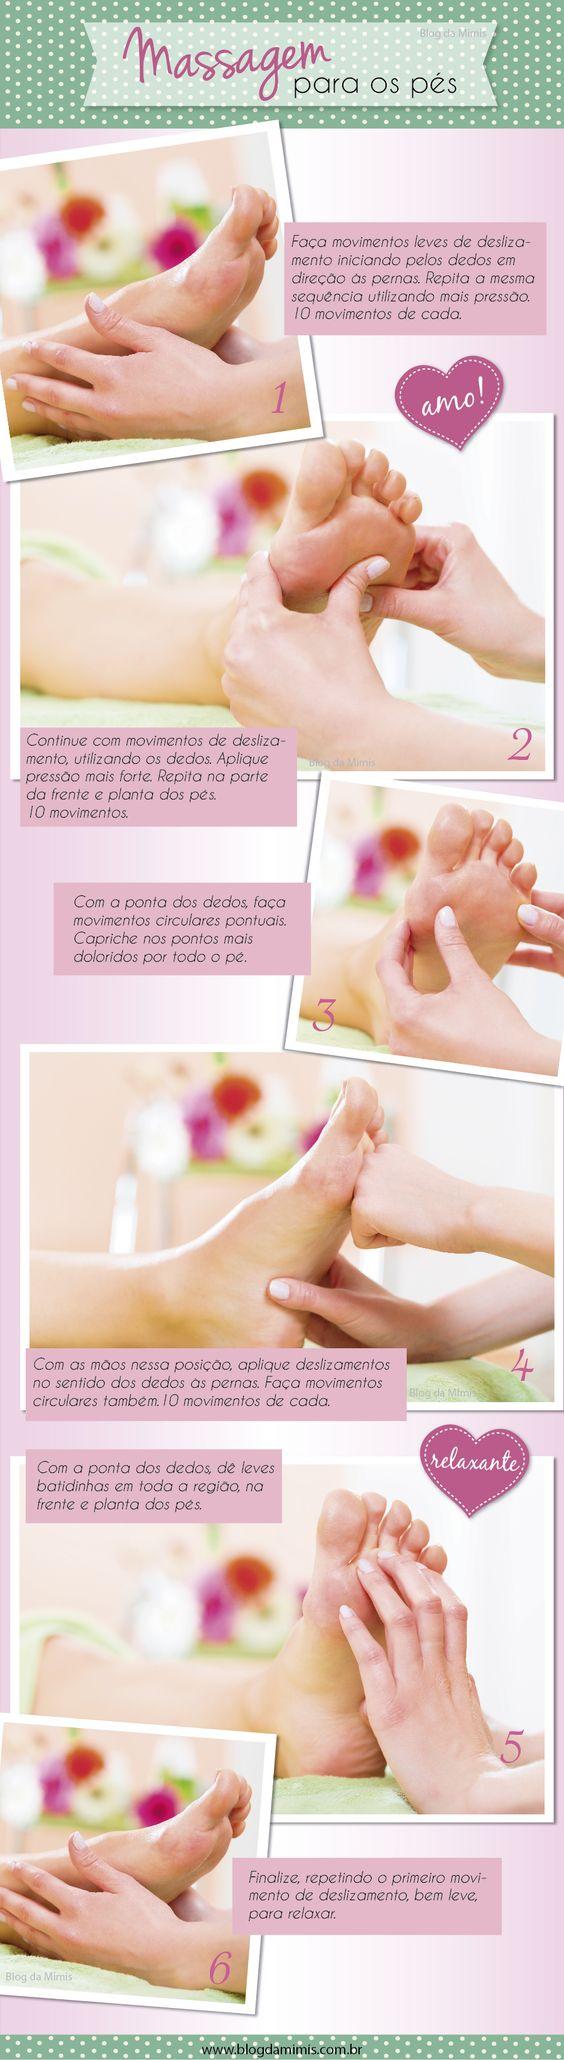 Massagem para os pés: